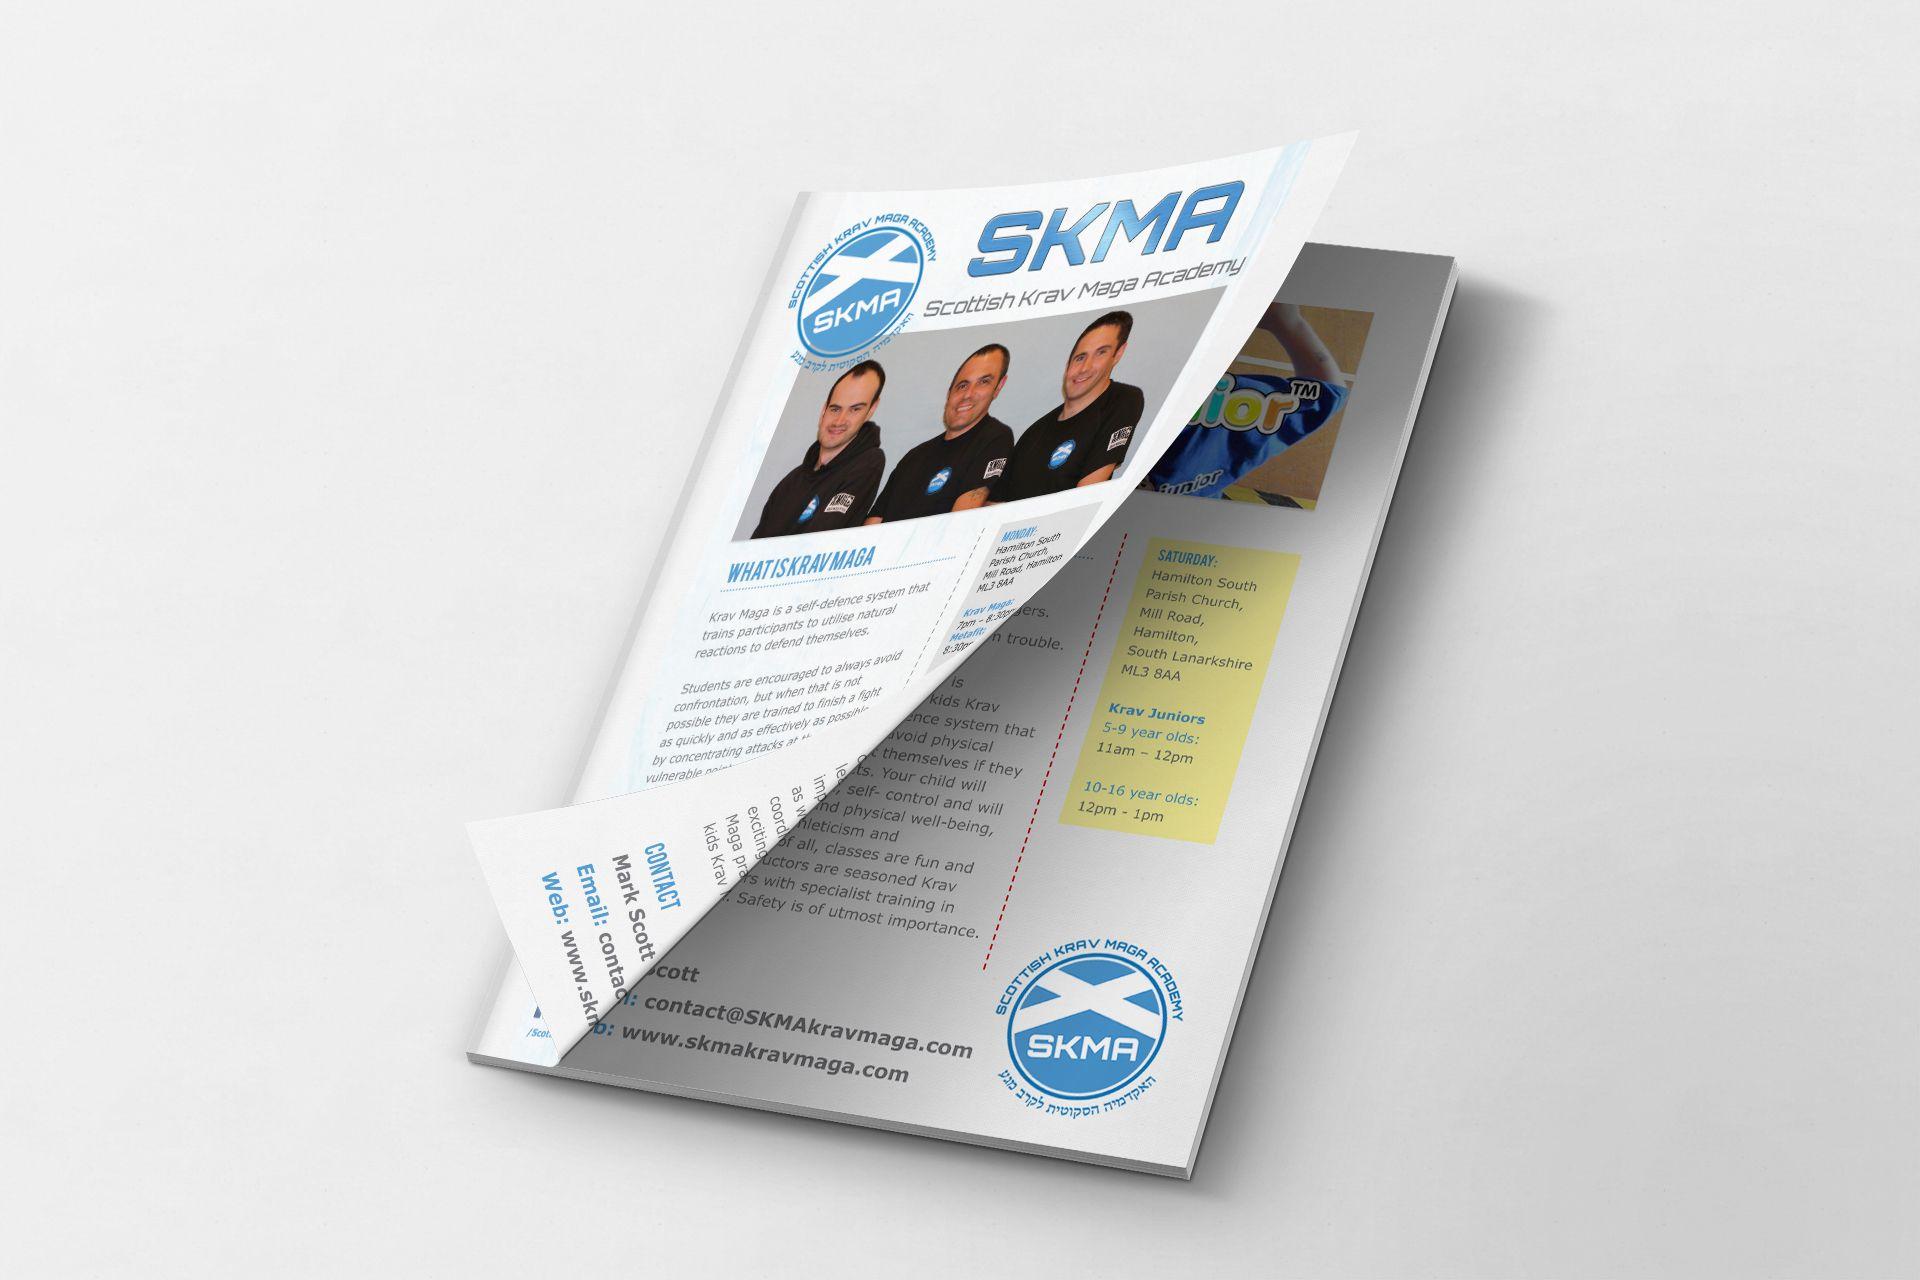 Some Design Processes And Advertising For Skma Kravmaga Branding Including Banner Stands Flyers Website Outdoor Branding Process Branding Krav Maga